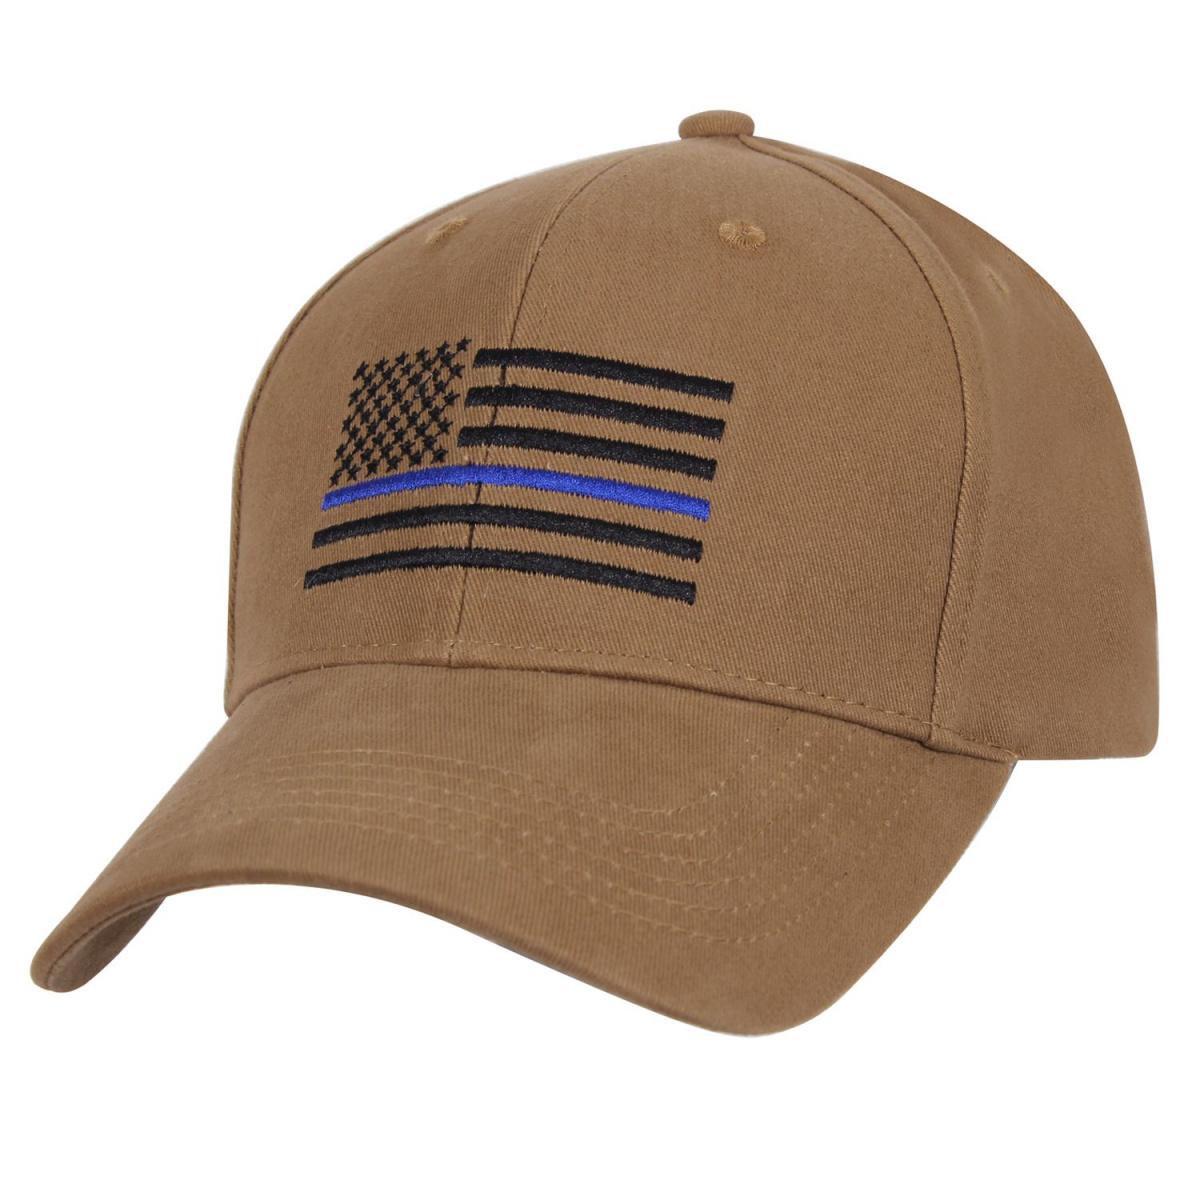 bef67d9e2e04 velky 1549459731-cepice-baseball-us-vlajka-s-modrou-linkou-coyote.jpg